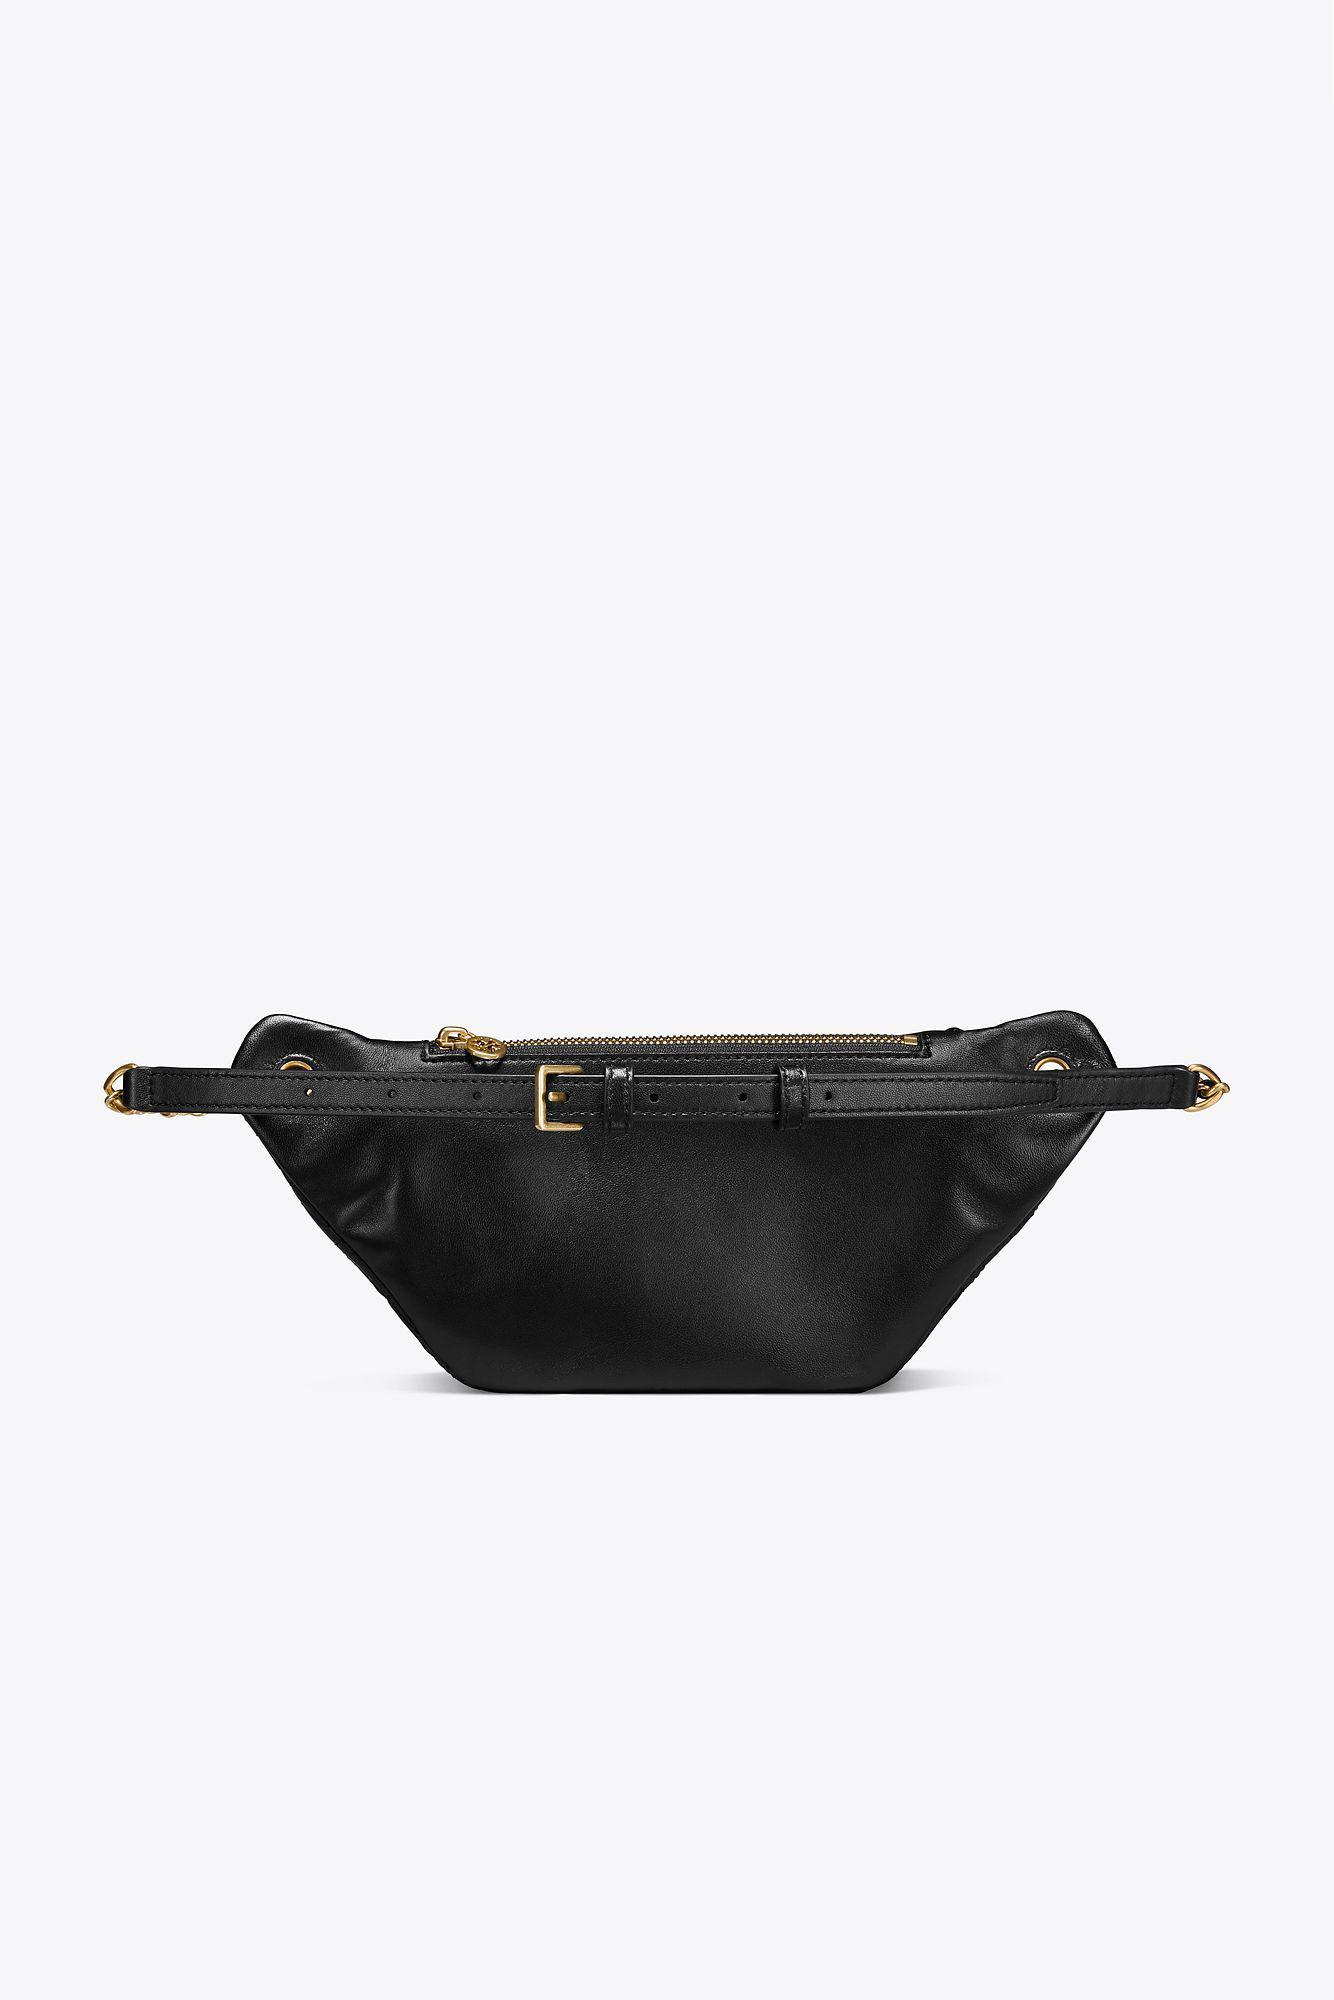 48b5a337bb00 Tory Burch - Black Fleming Belt Bag - Lyst. View fullscreen